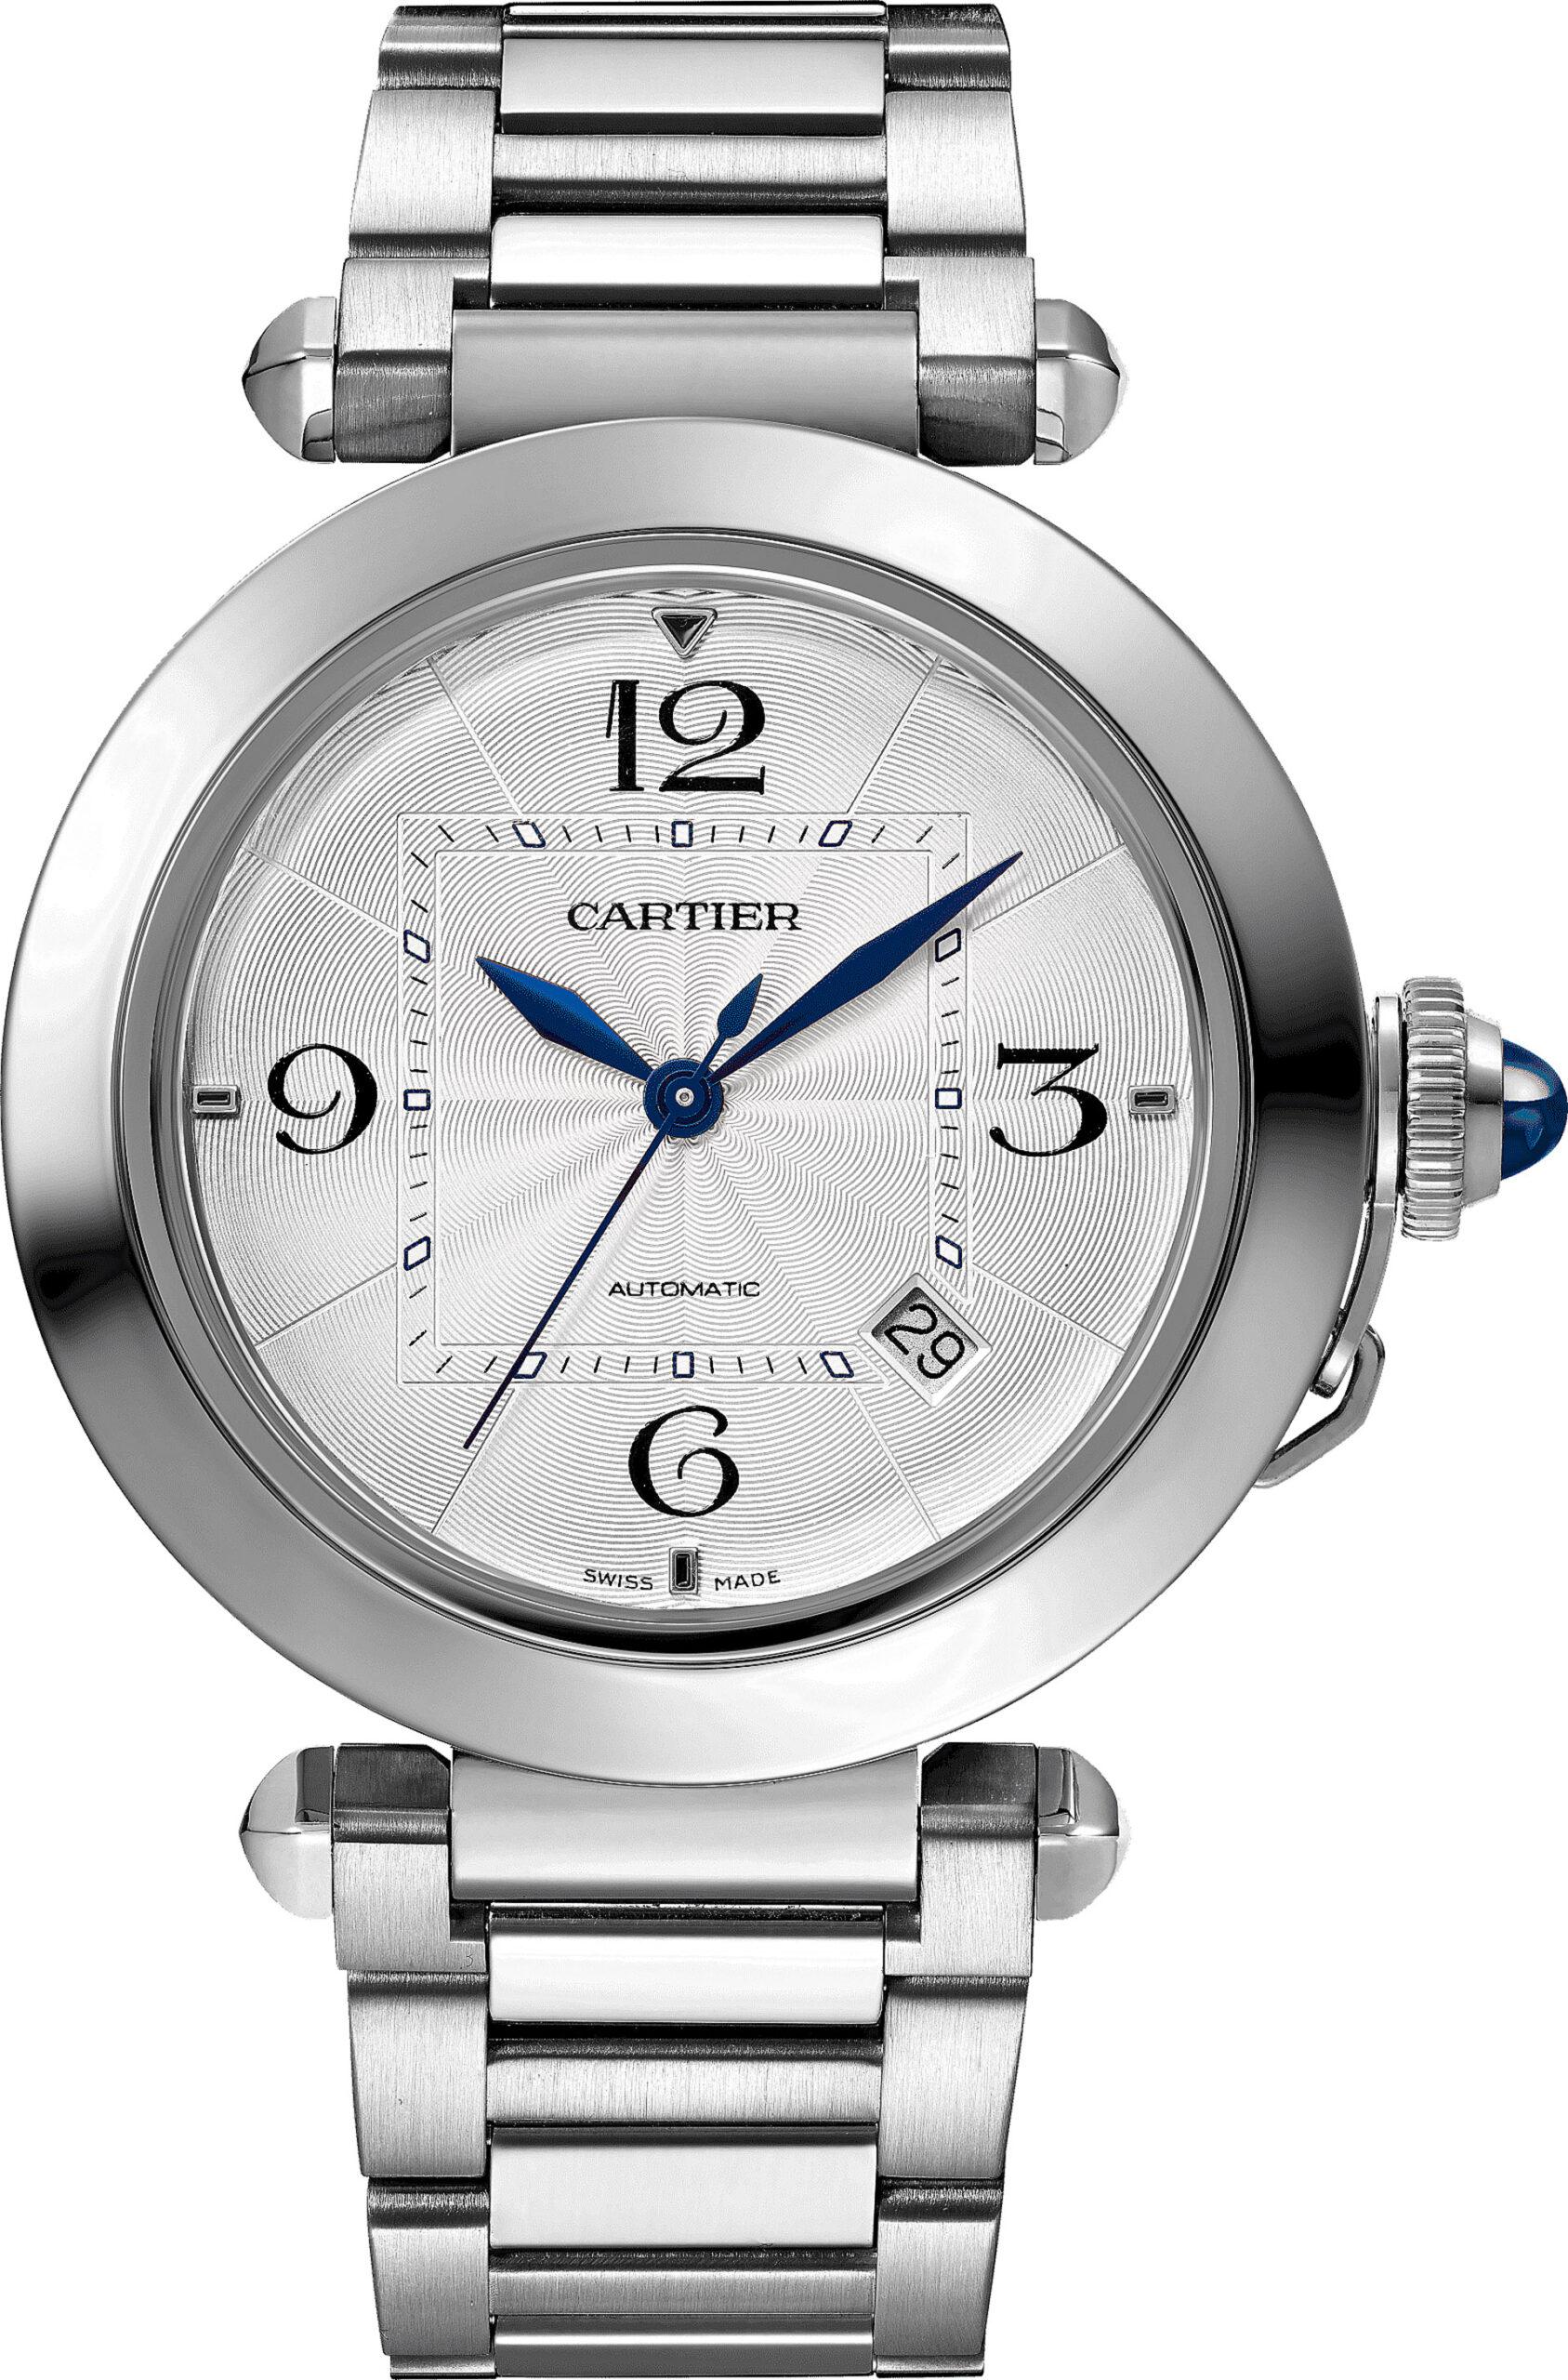 Cartier_Pasha_41mm